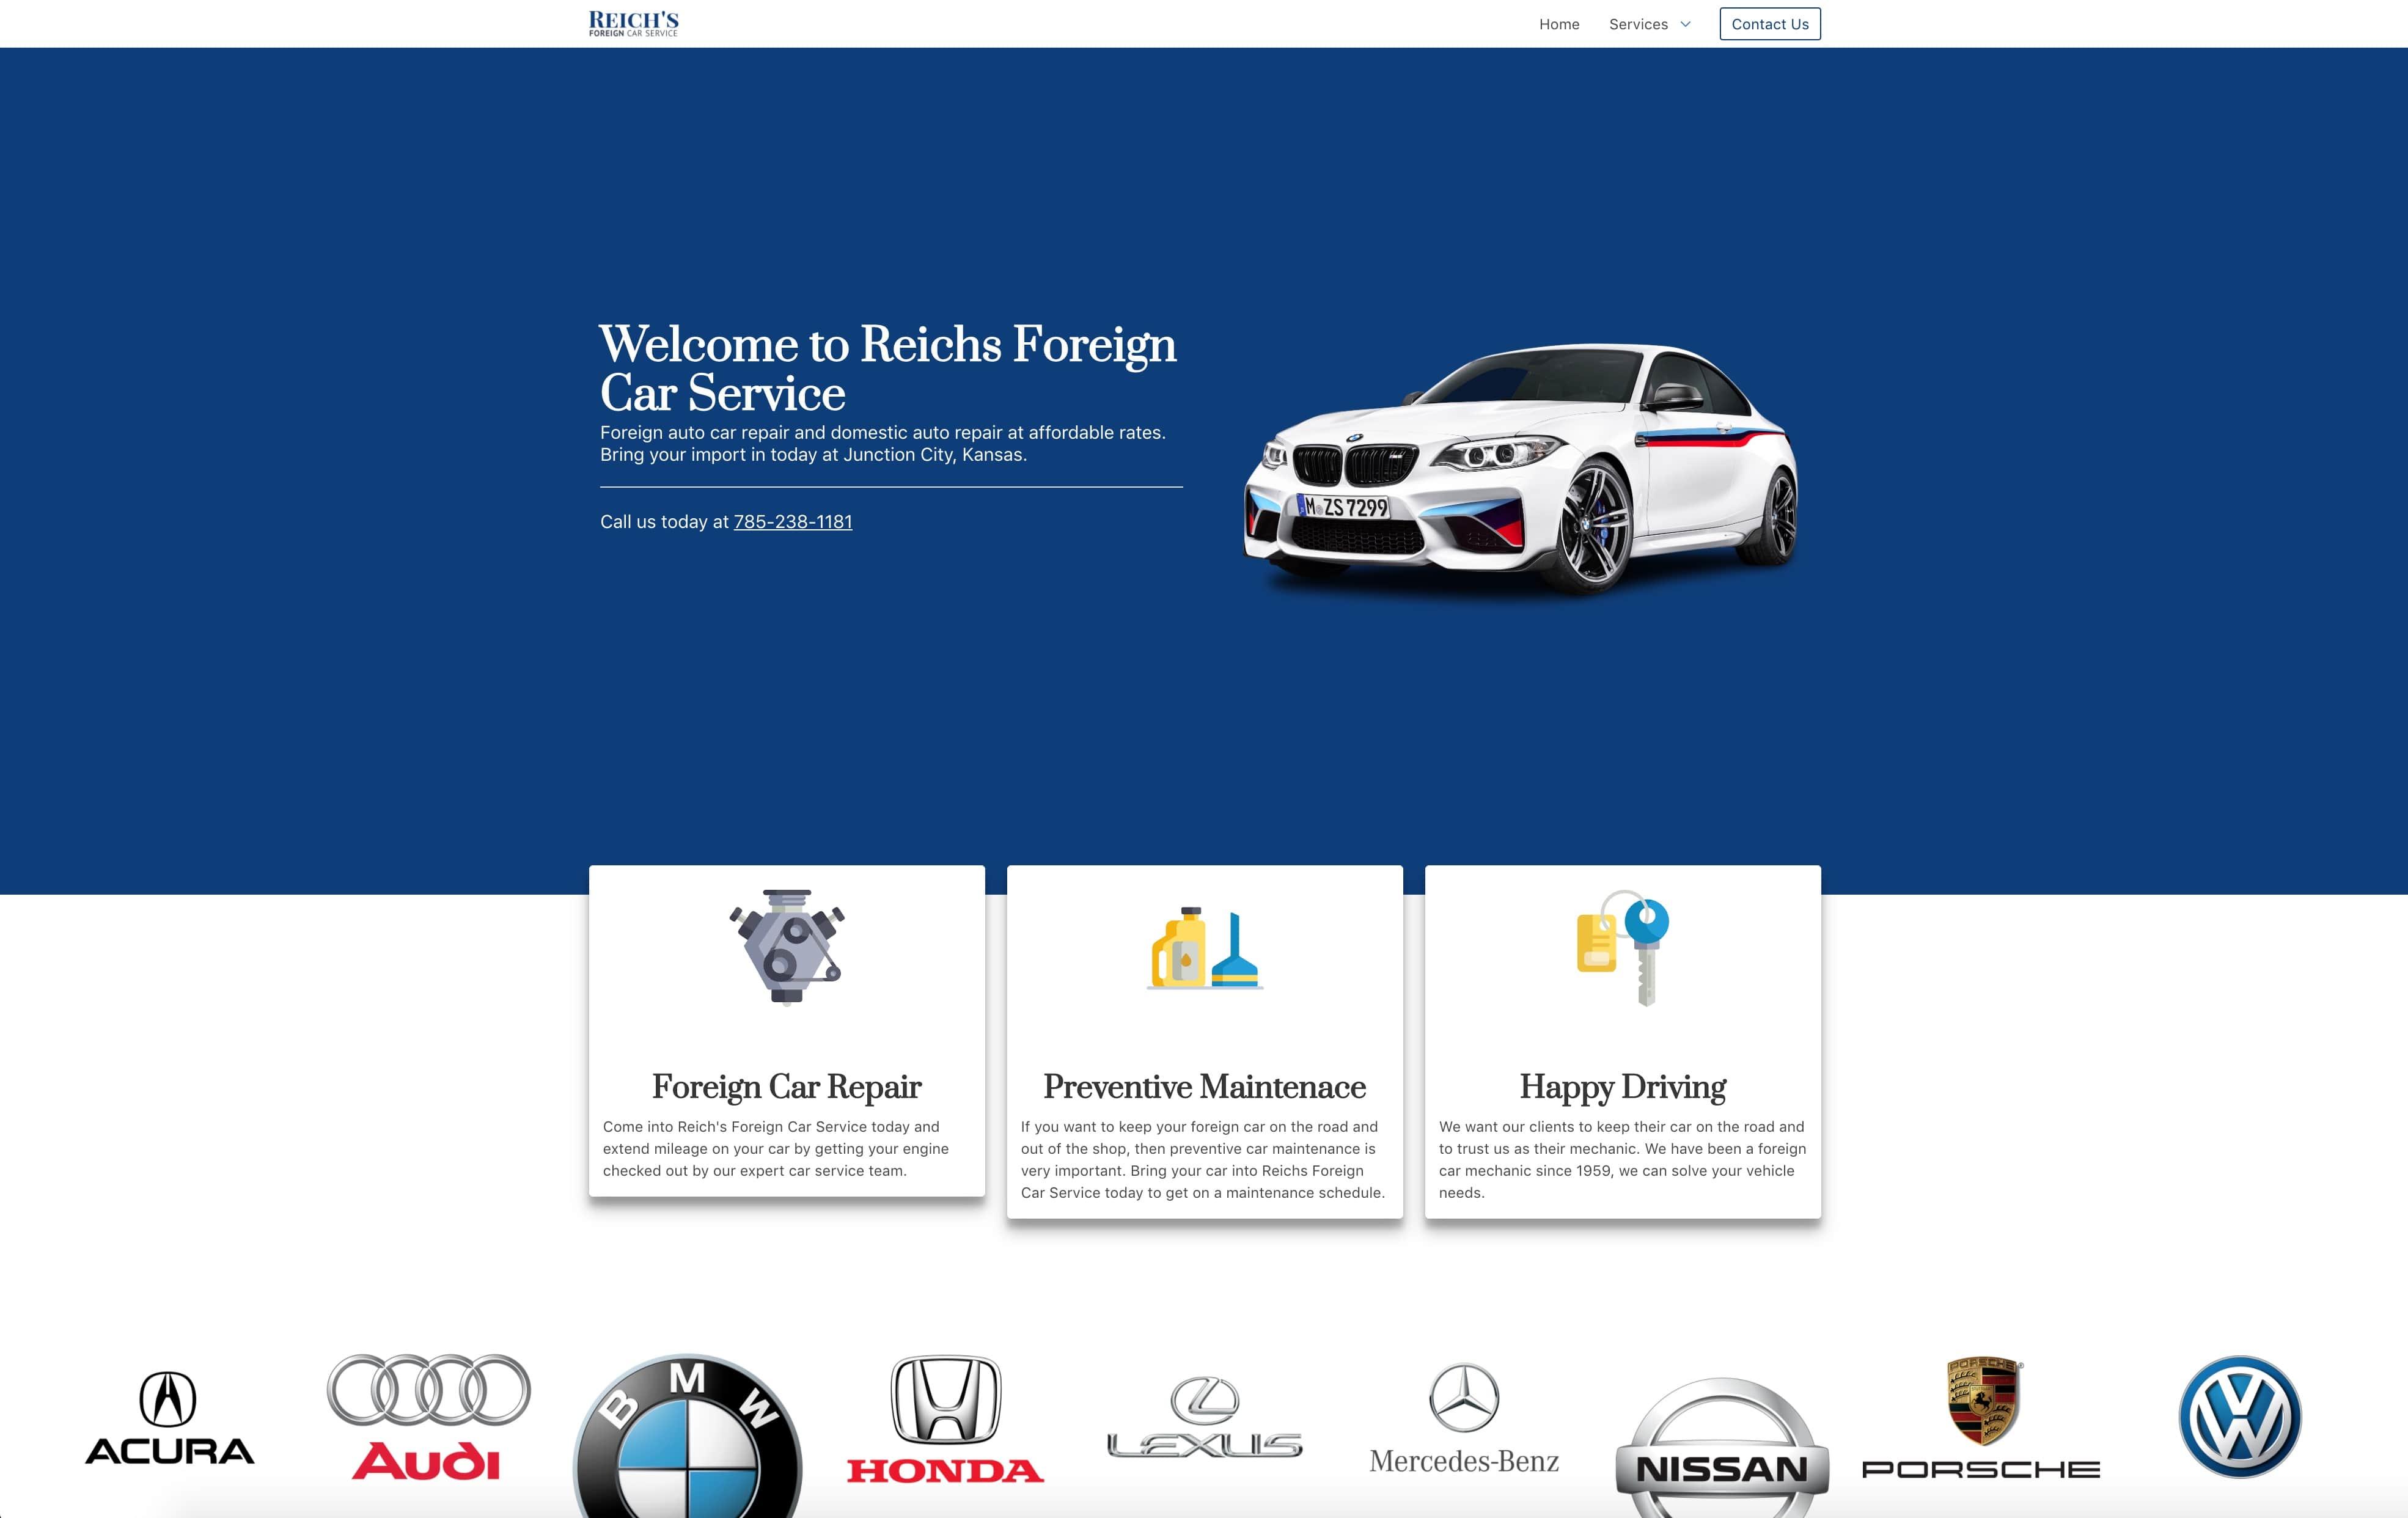 Reichs Foreign Car Service